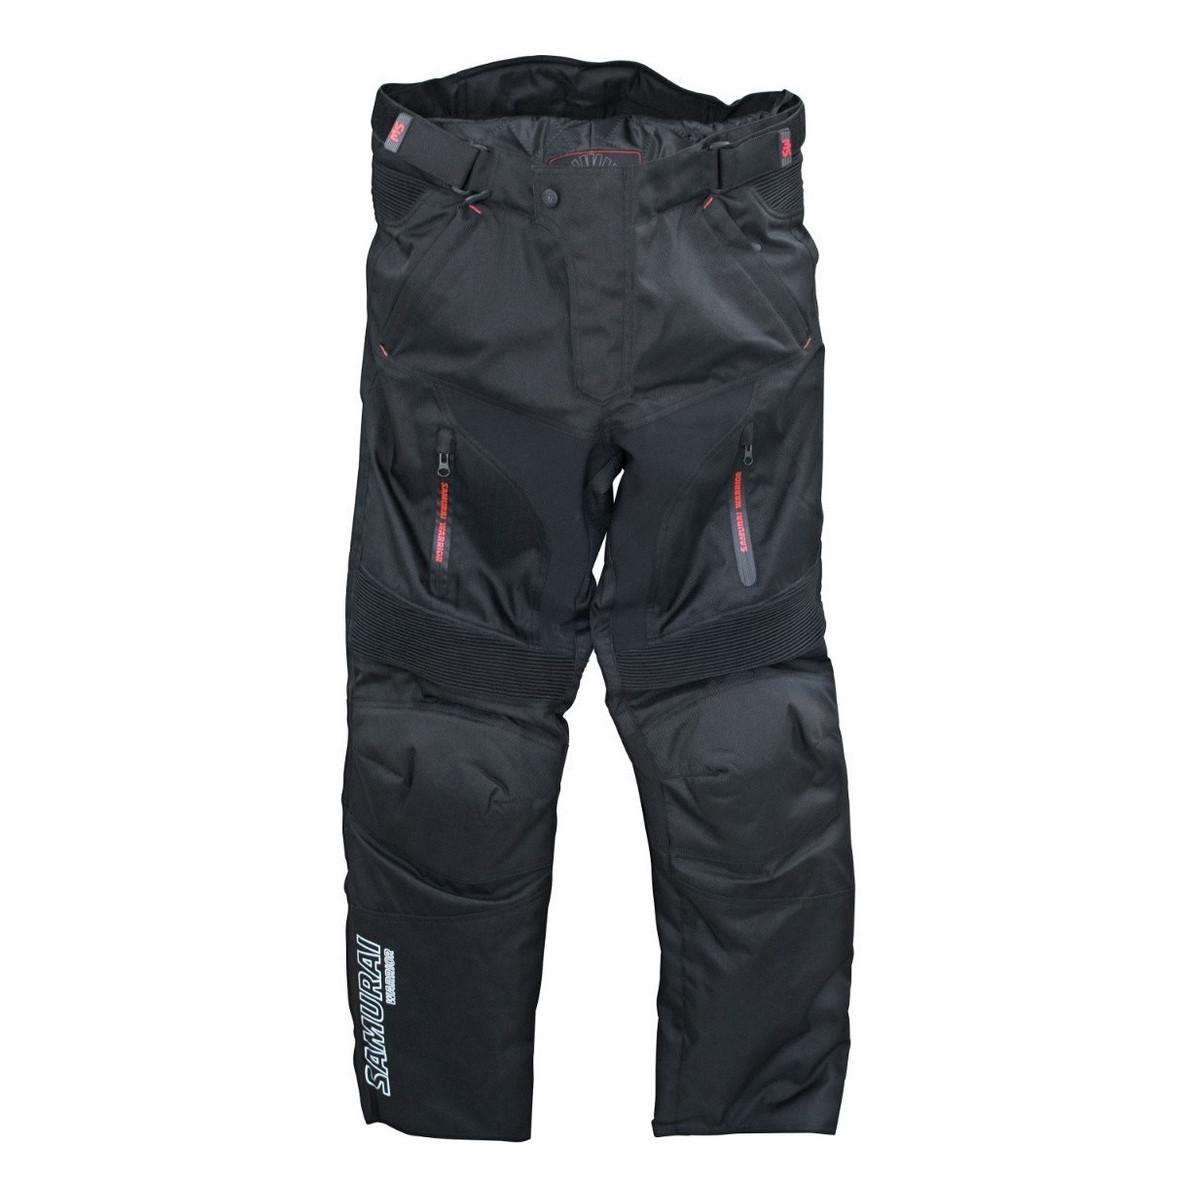 Pantalon de Turismo Samurai Warrior Lisboa